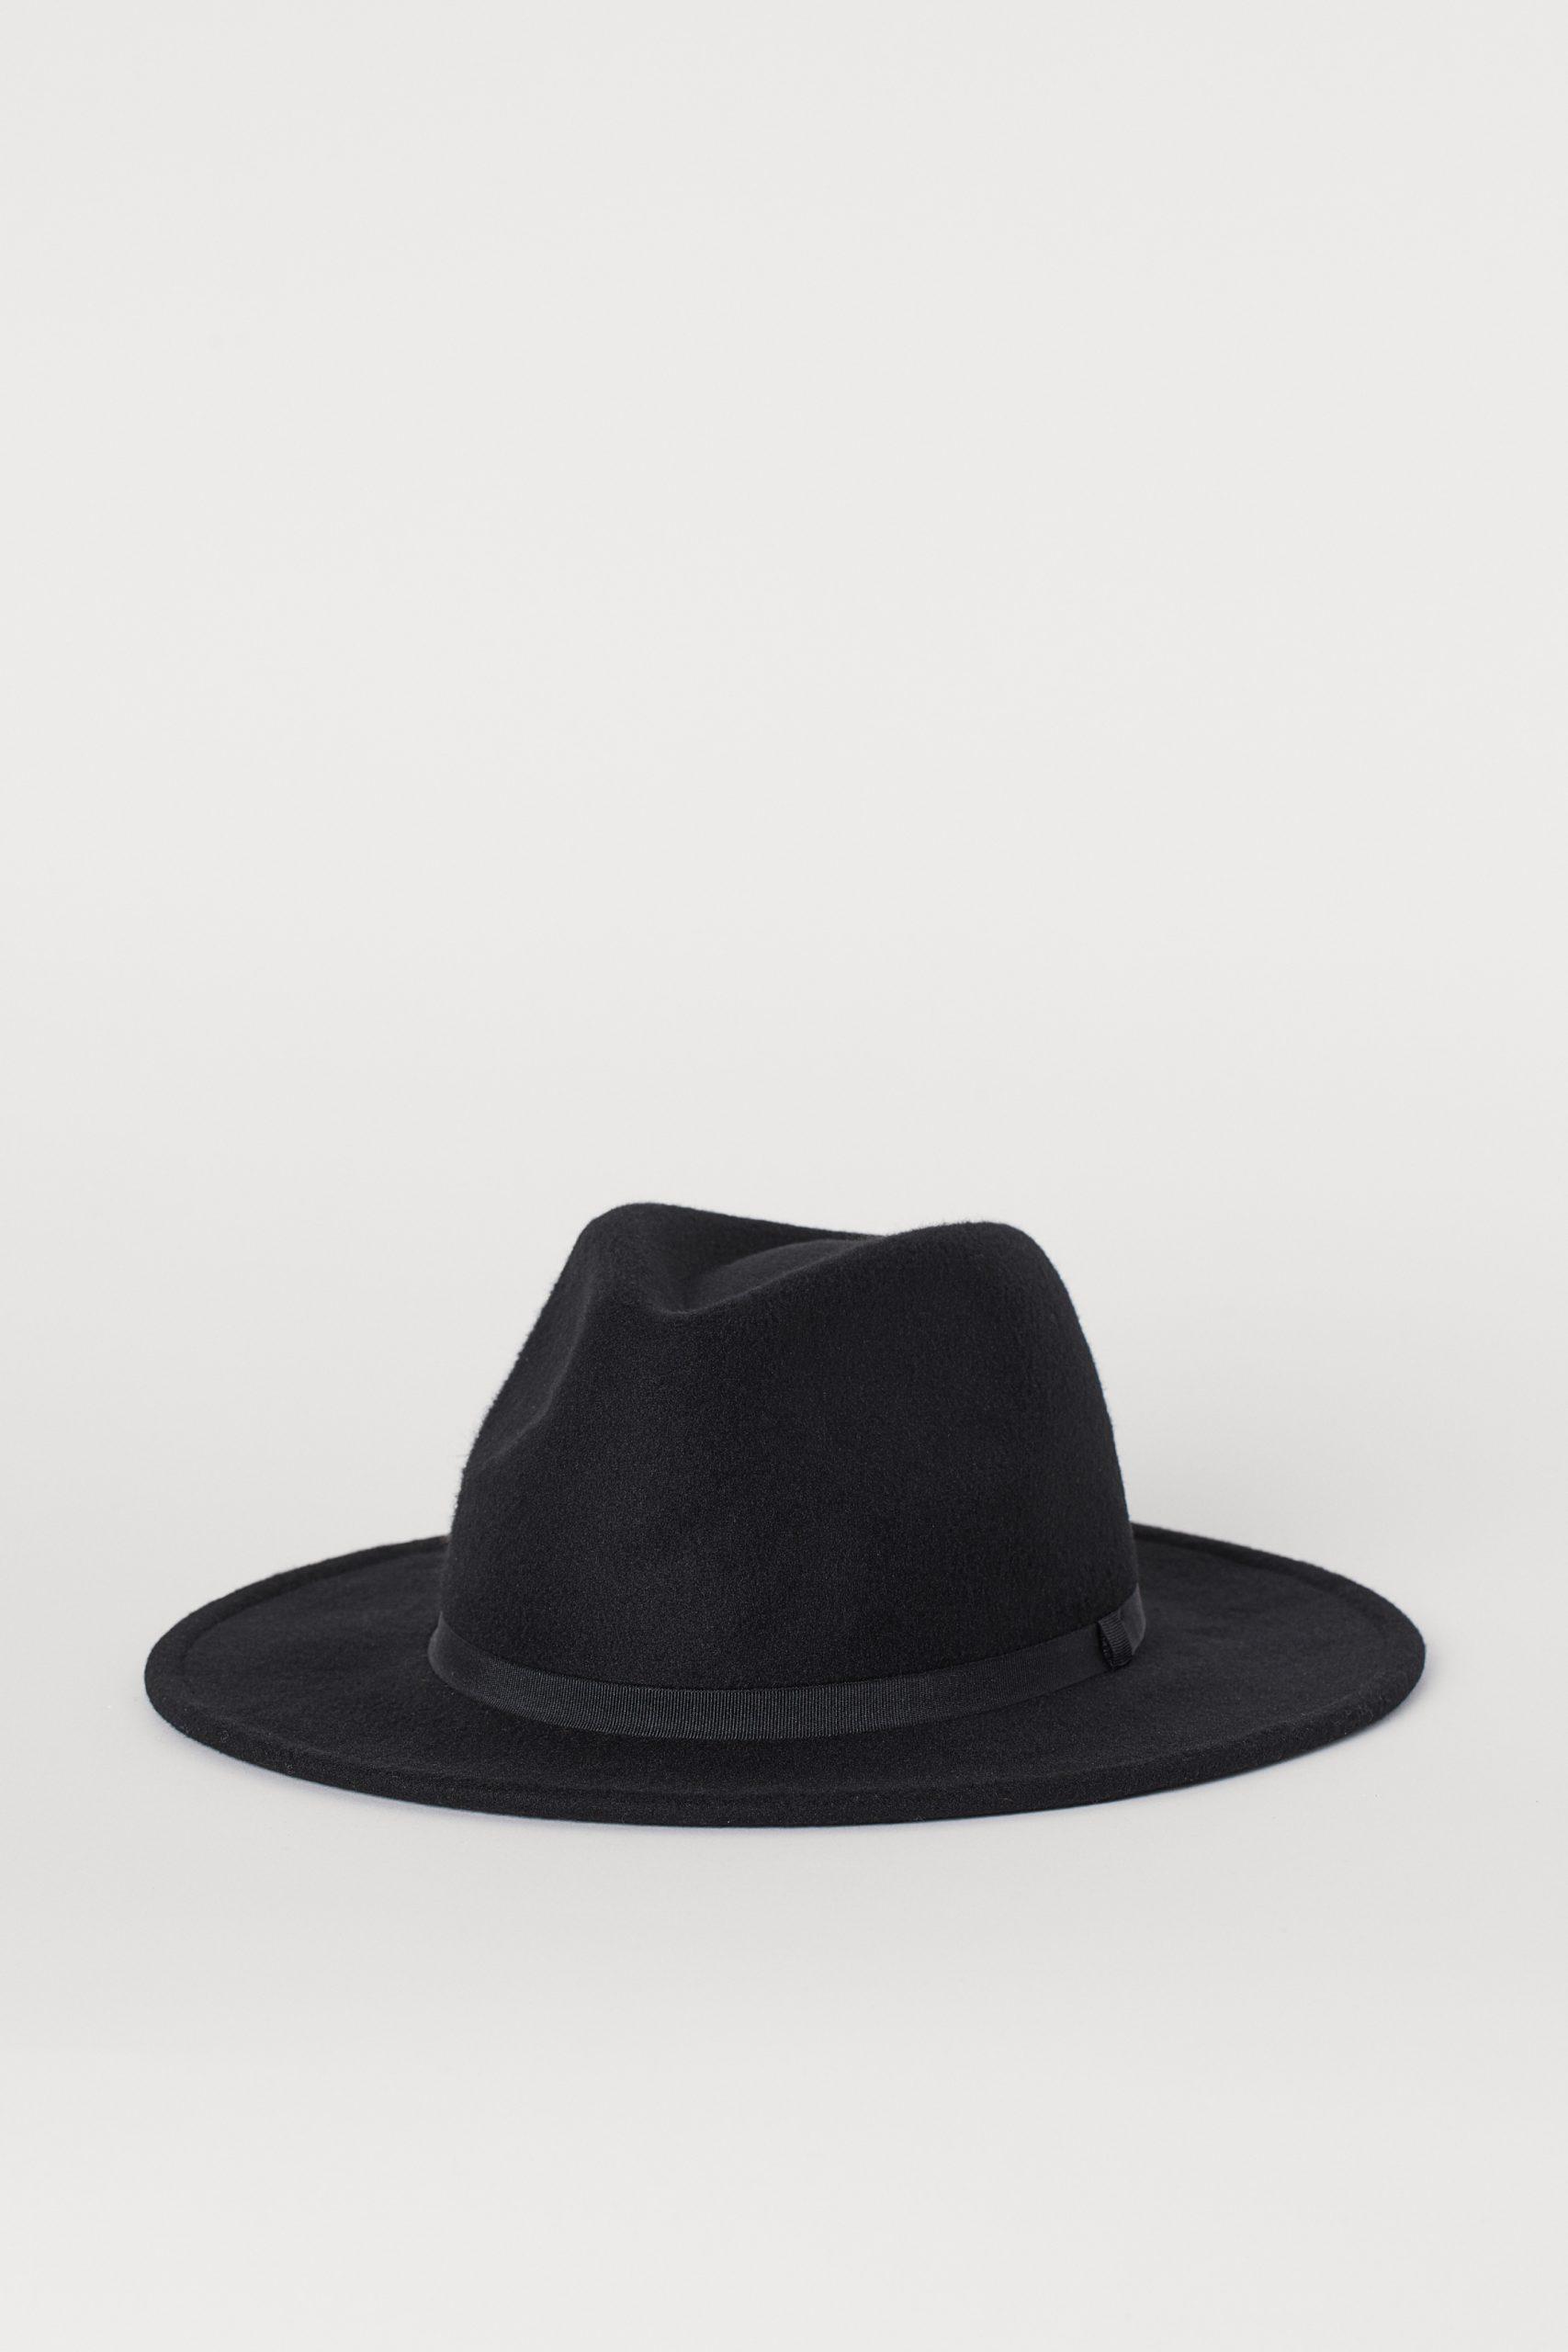 H&M Womens Felt Hat - Black